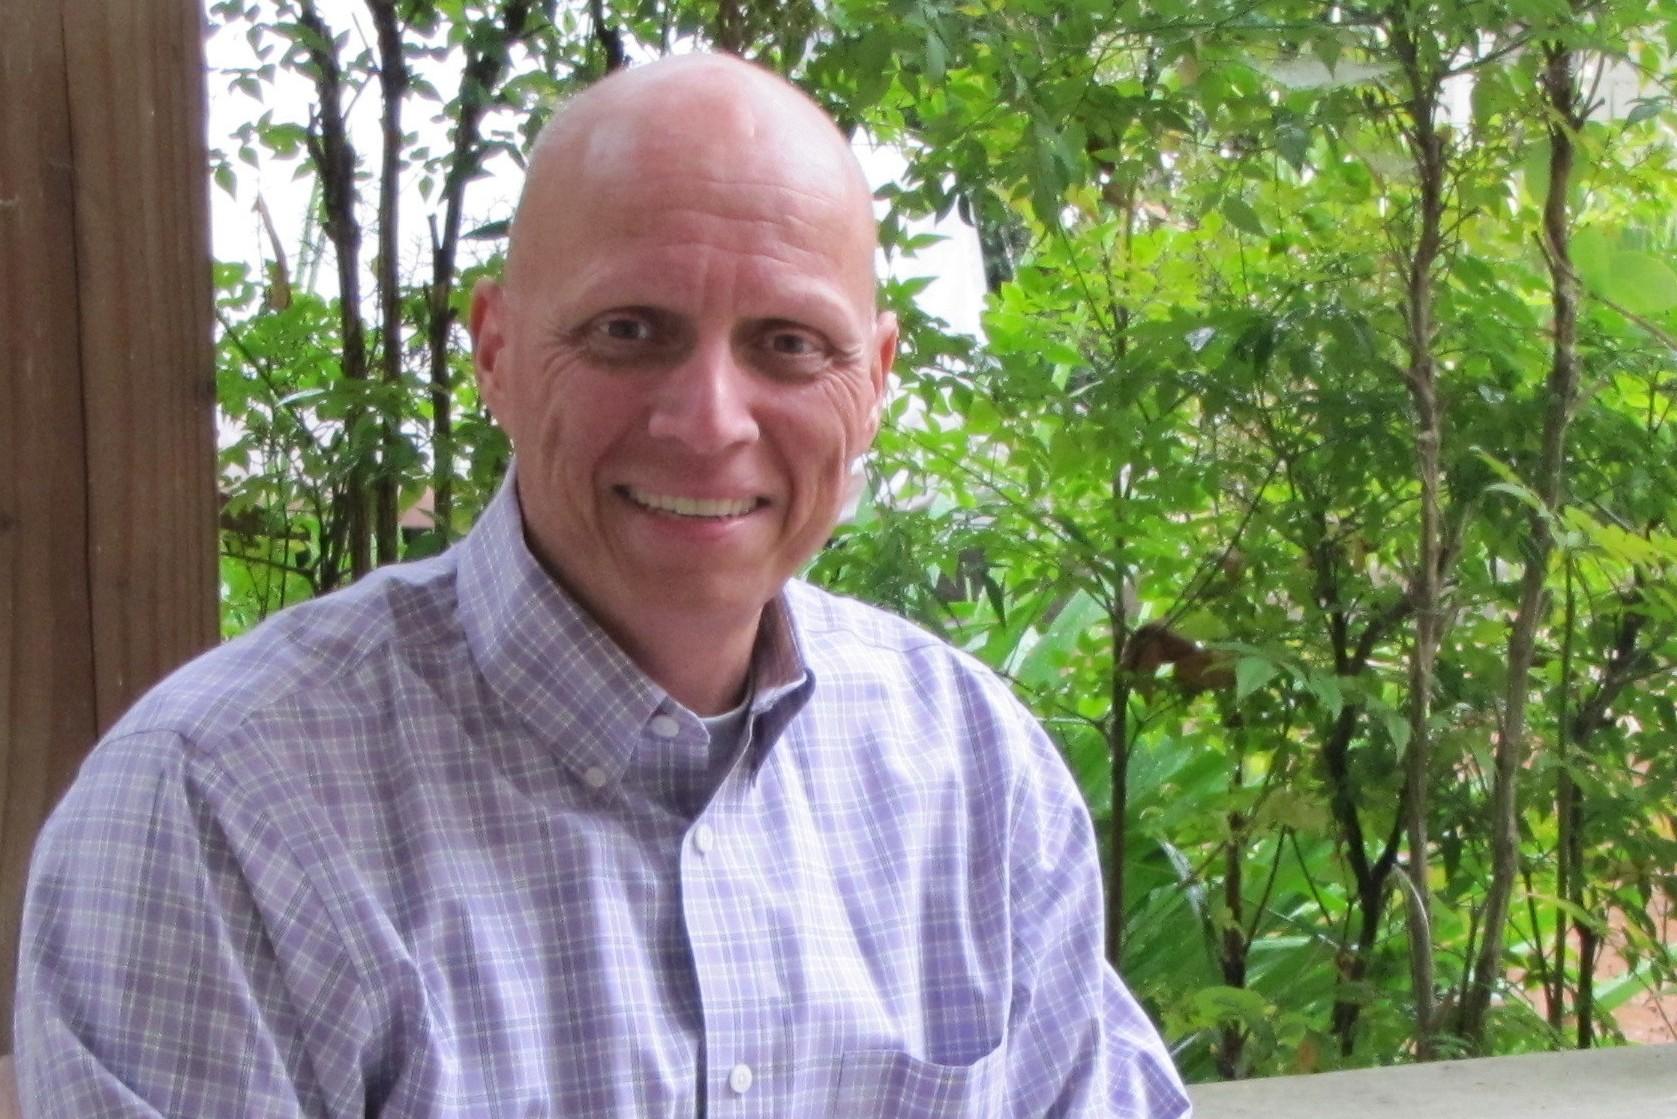 Chris Marino vCider CEO